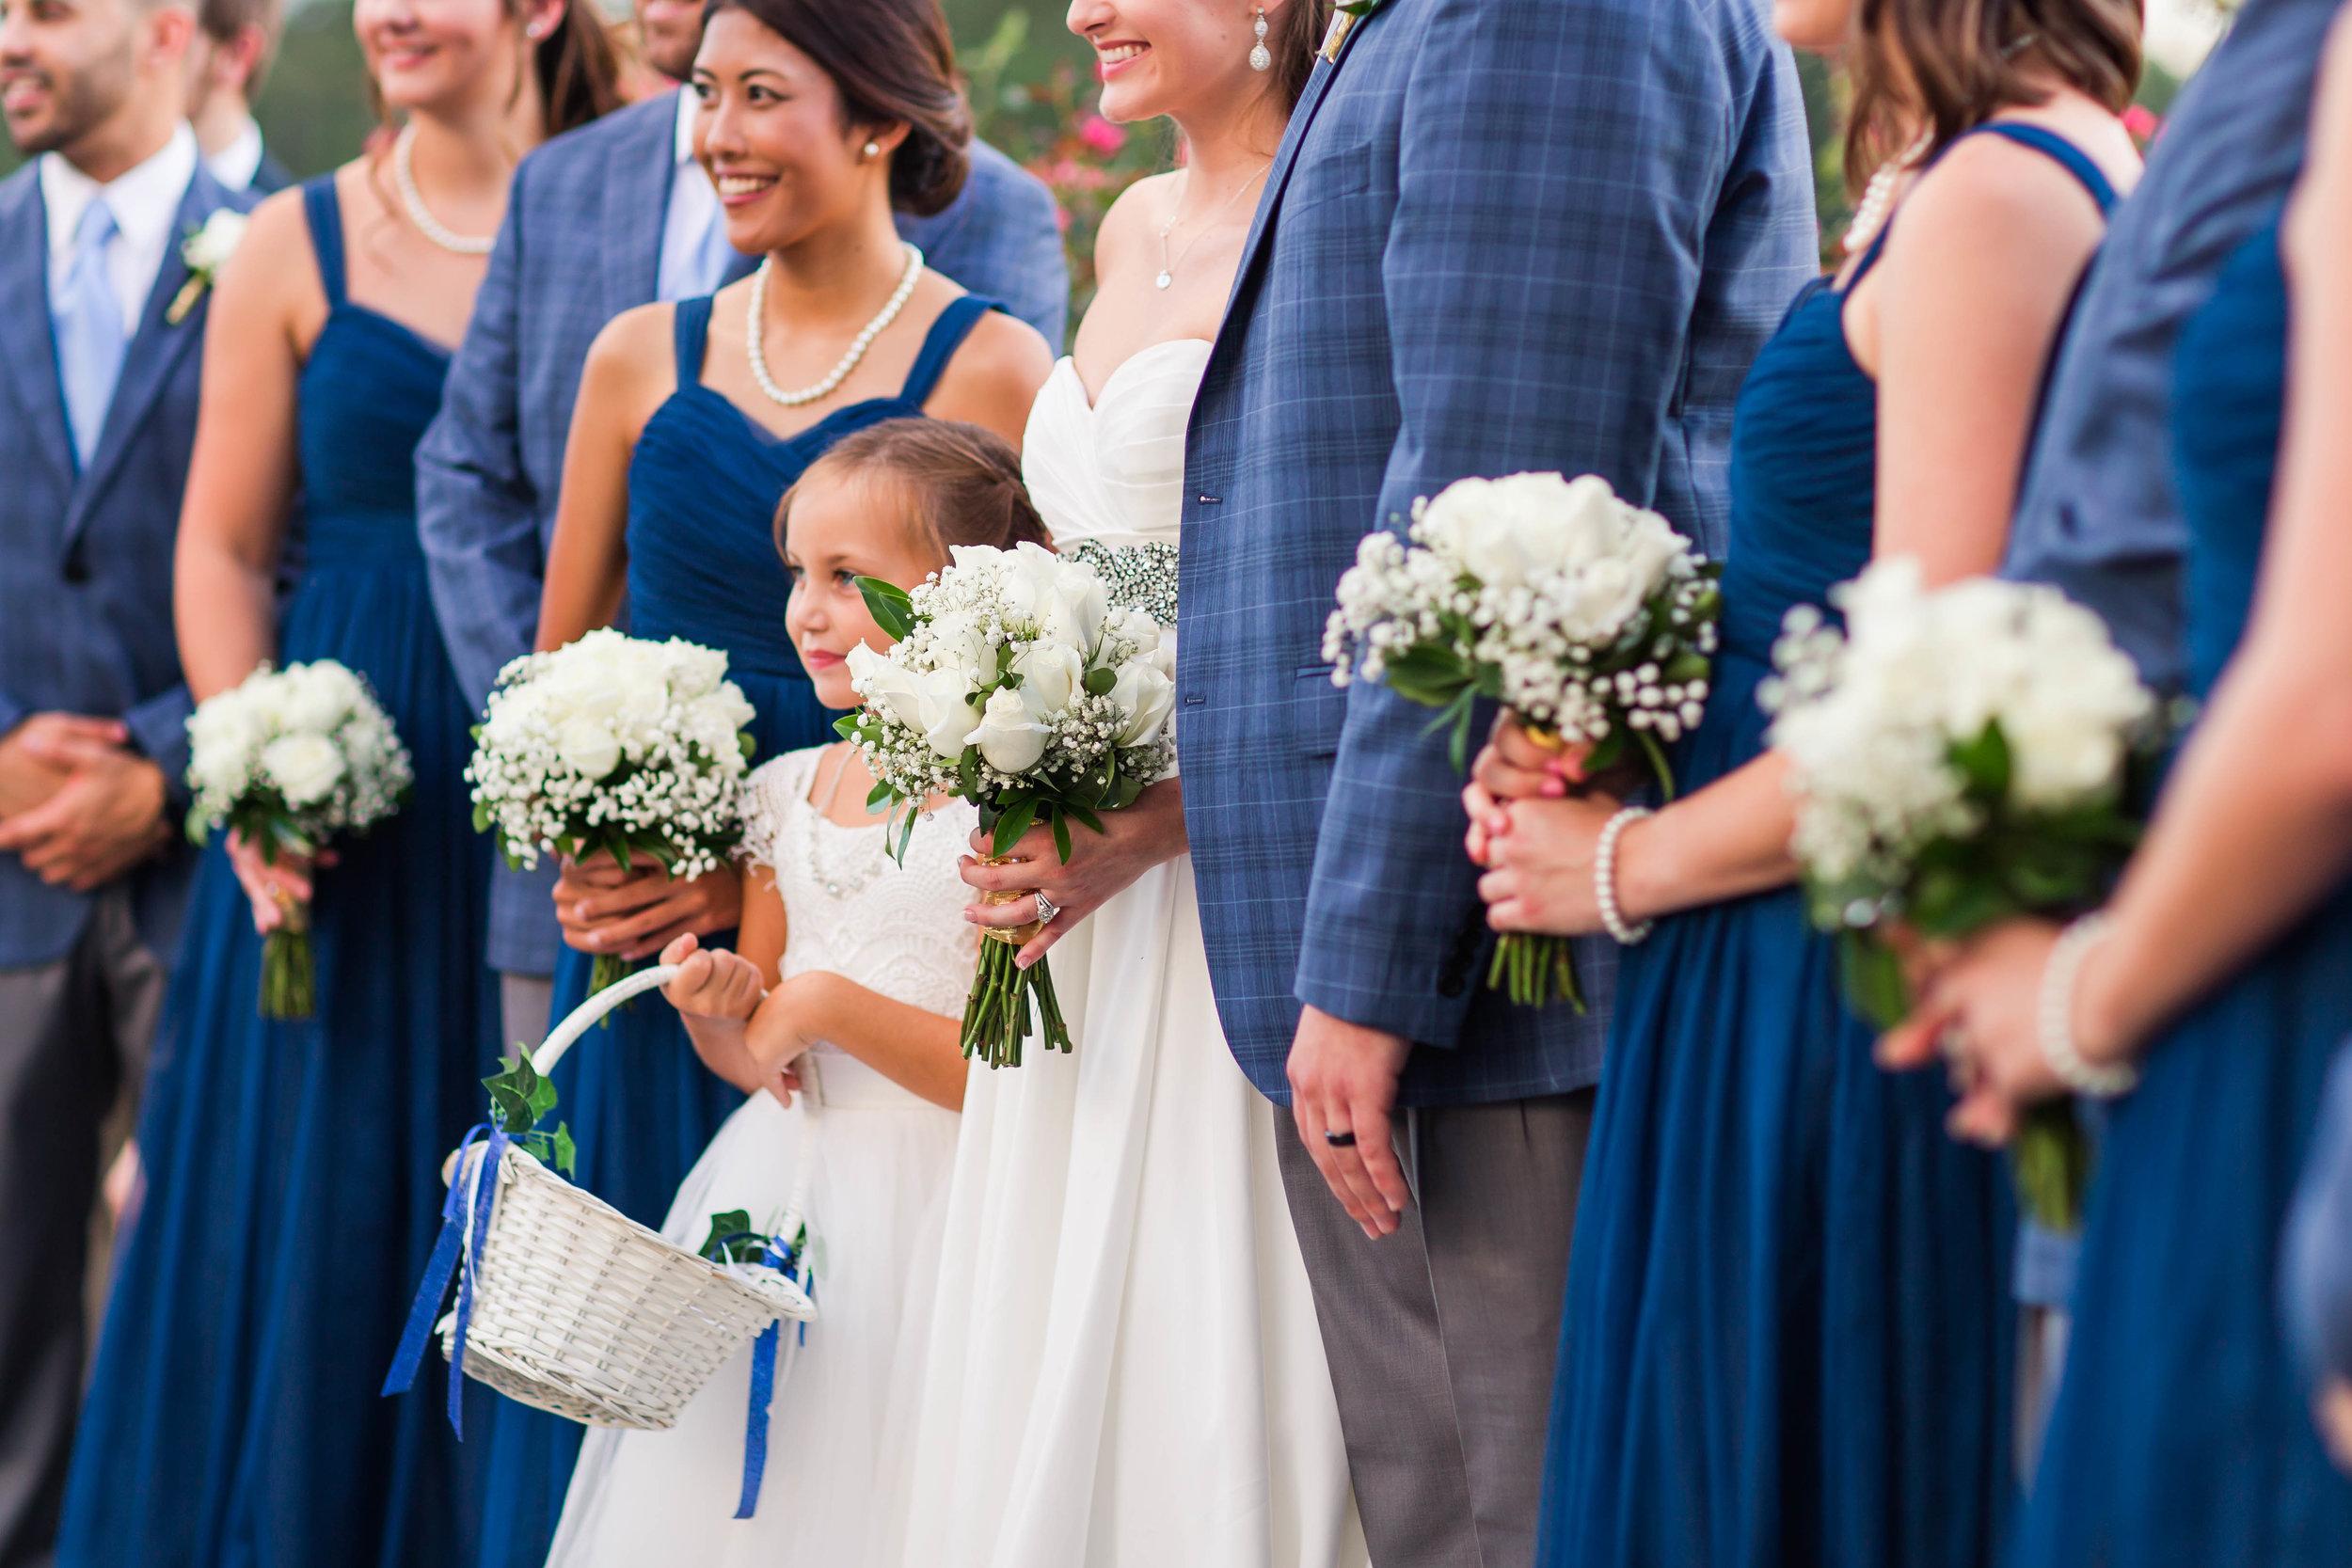 Hollomans_Family and Bridal Party_160.jpg